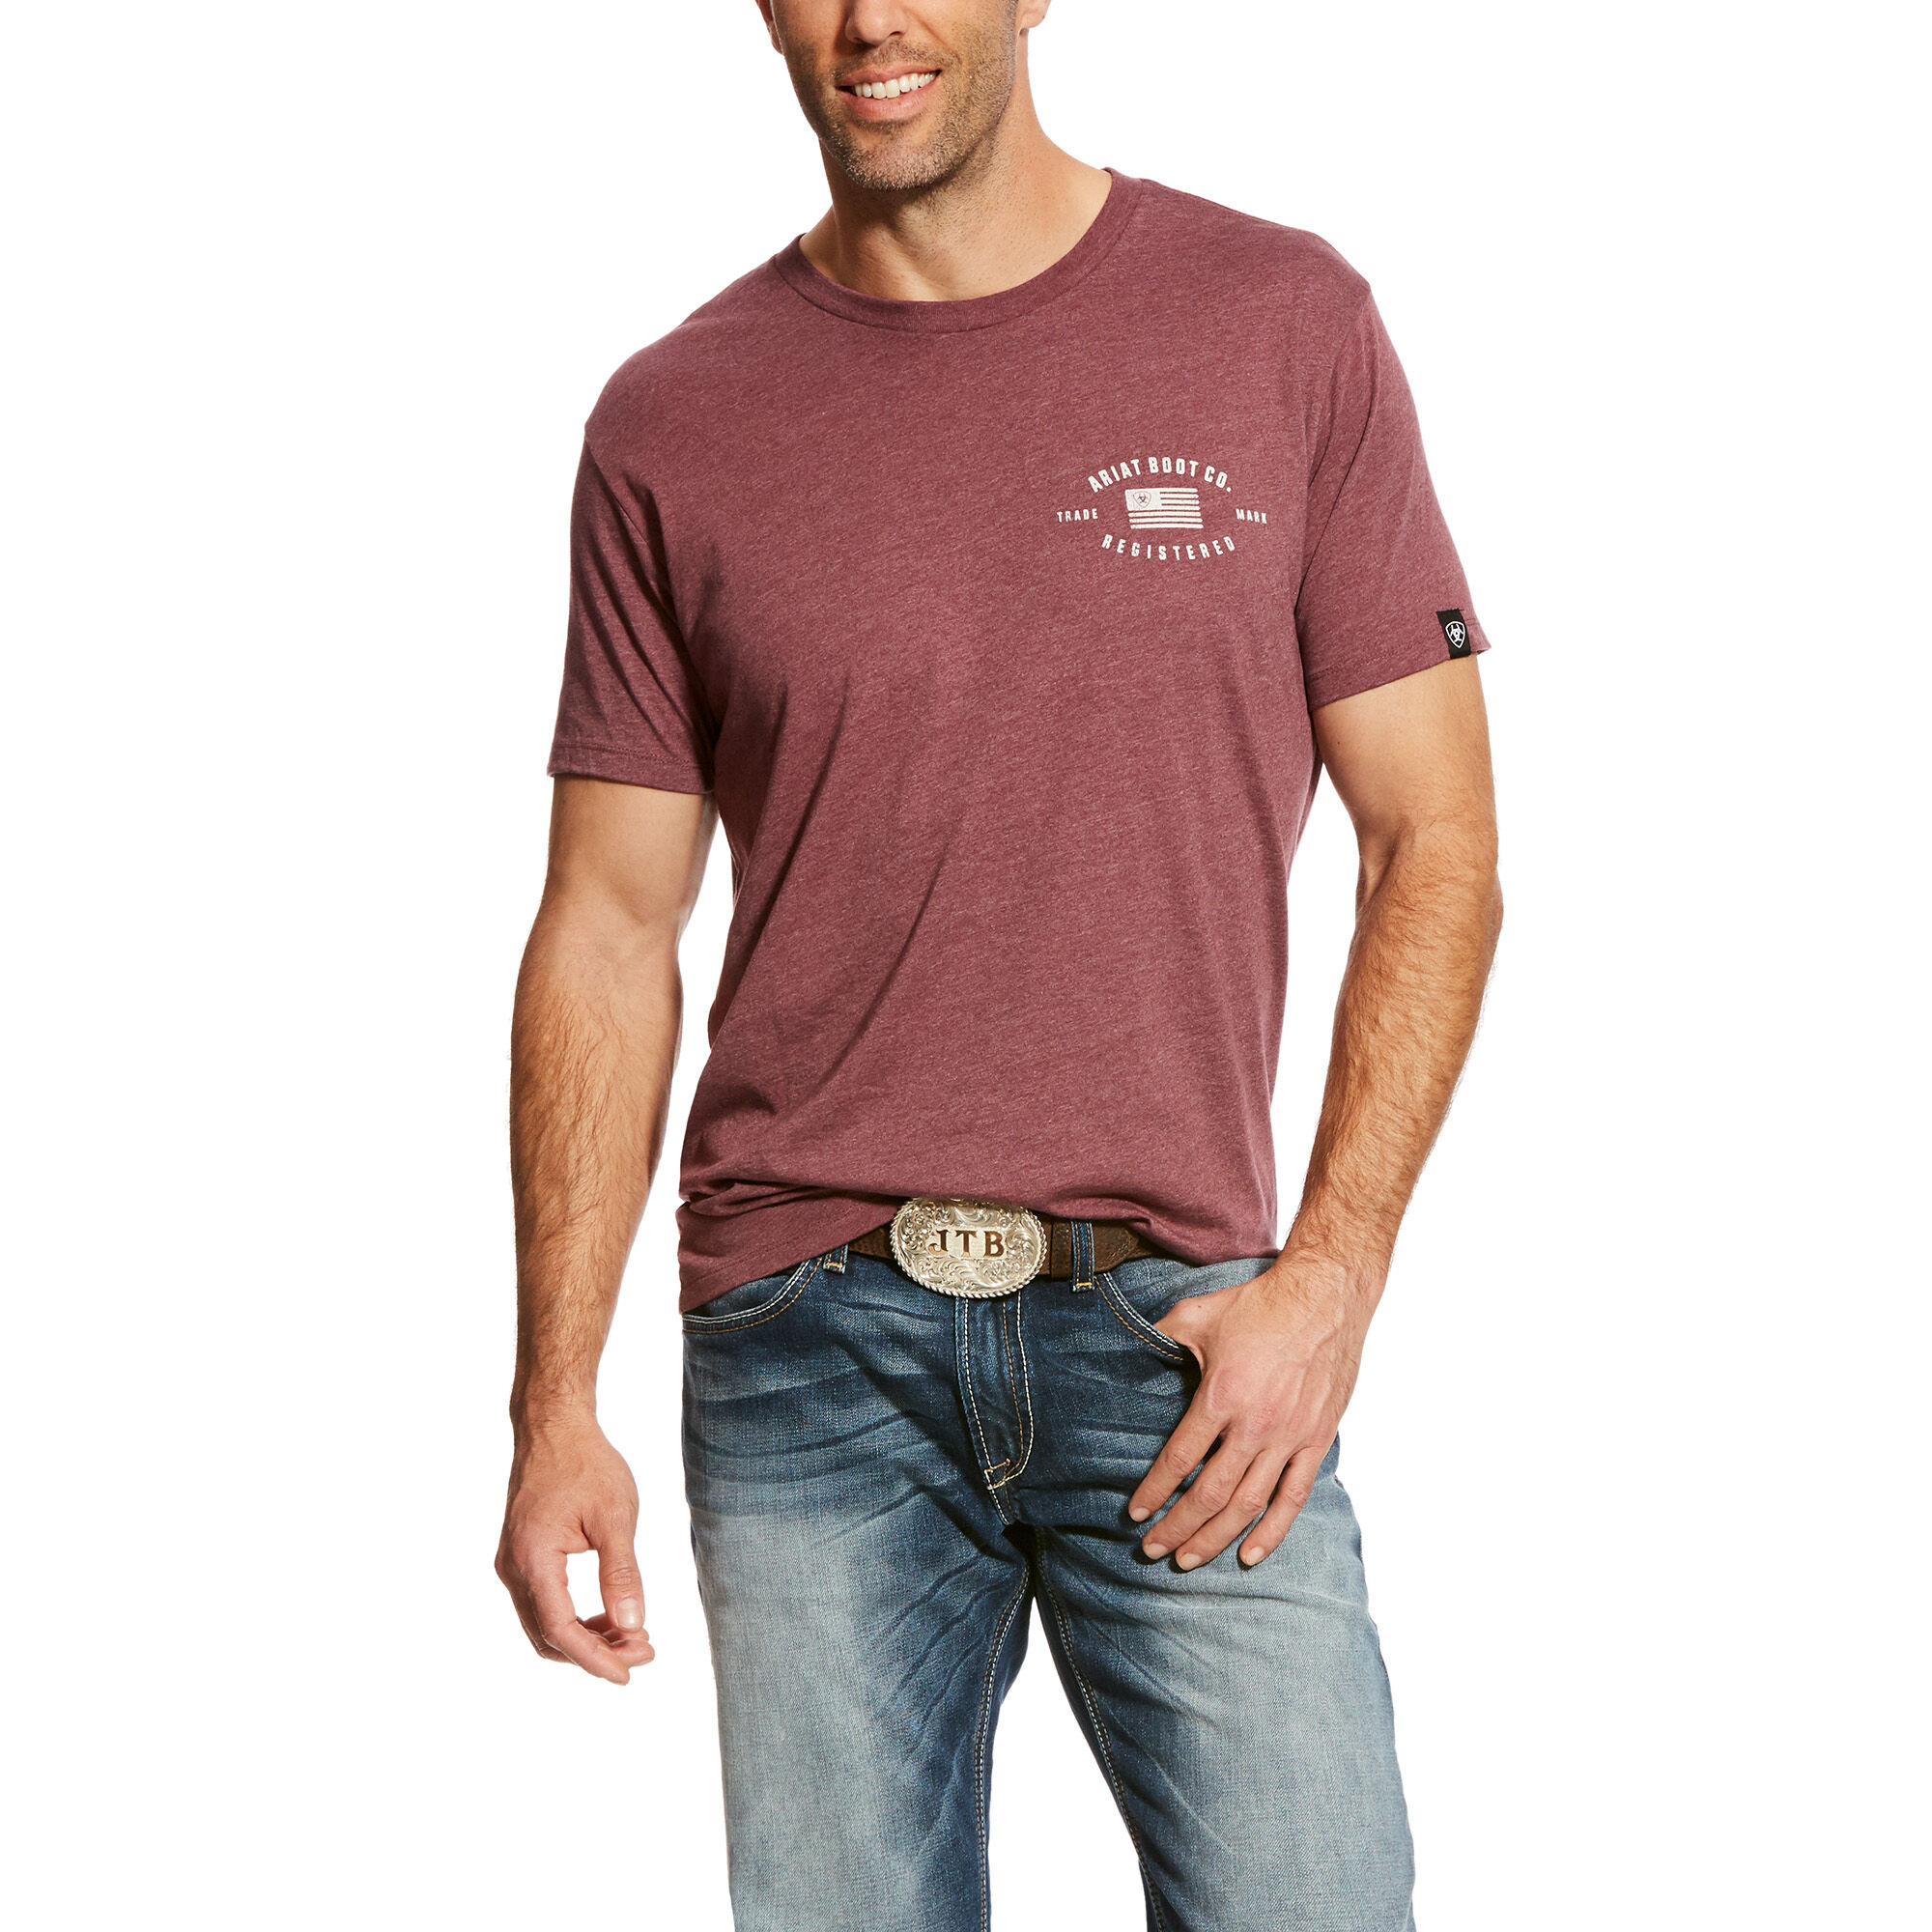 US Registered T-Shirt